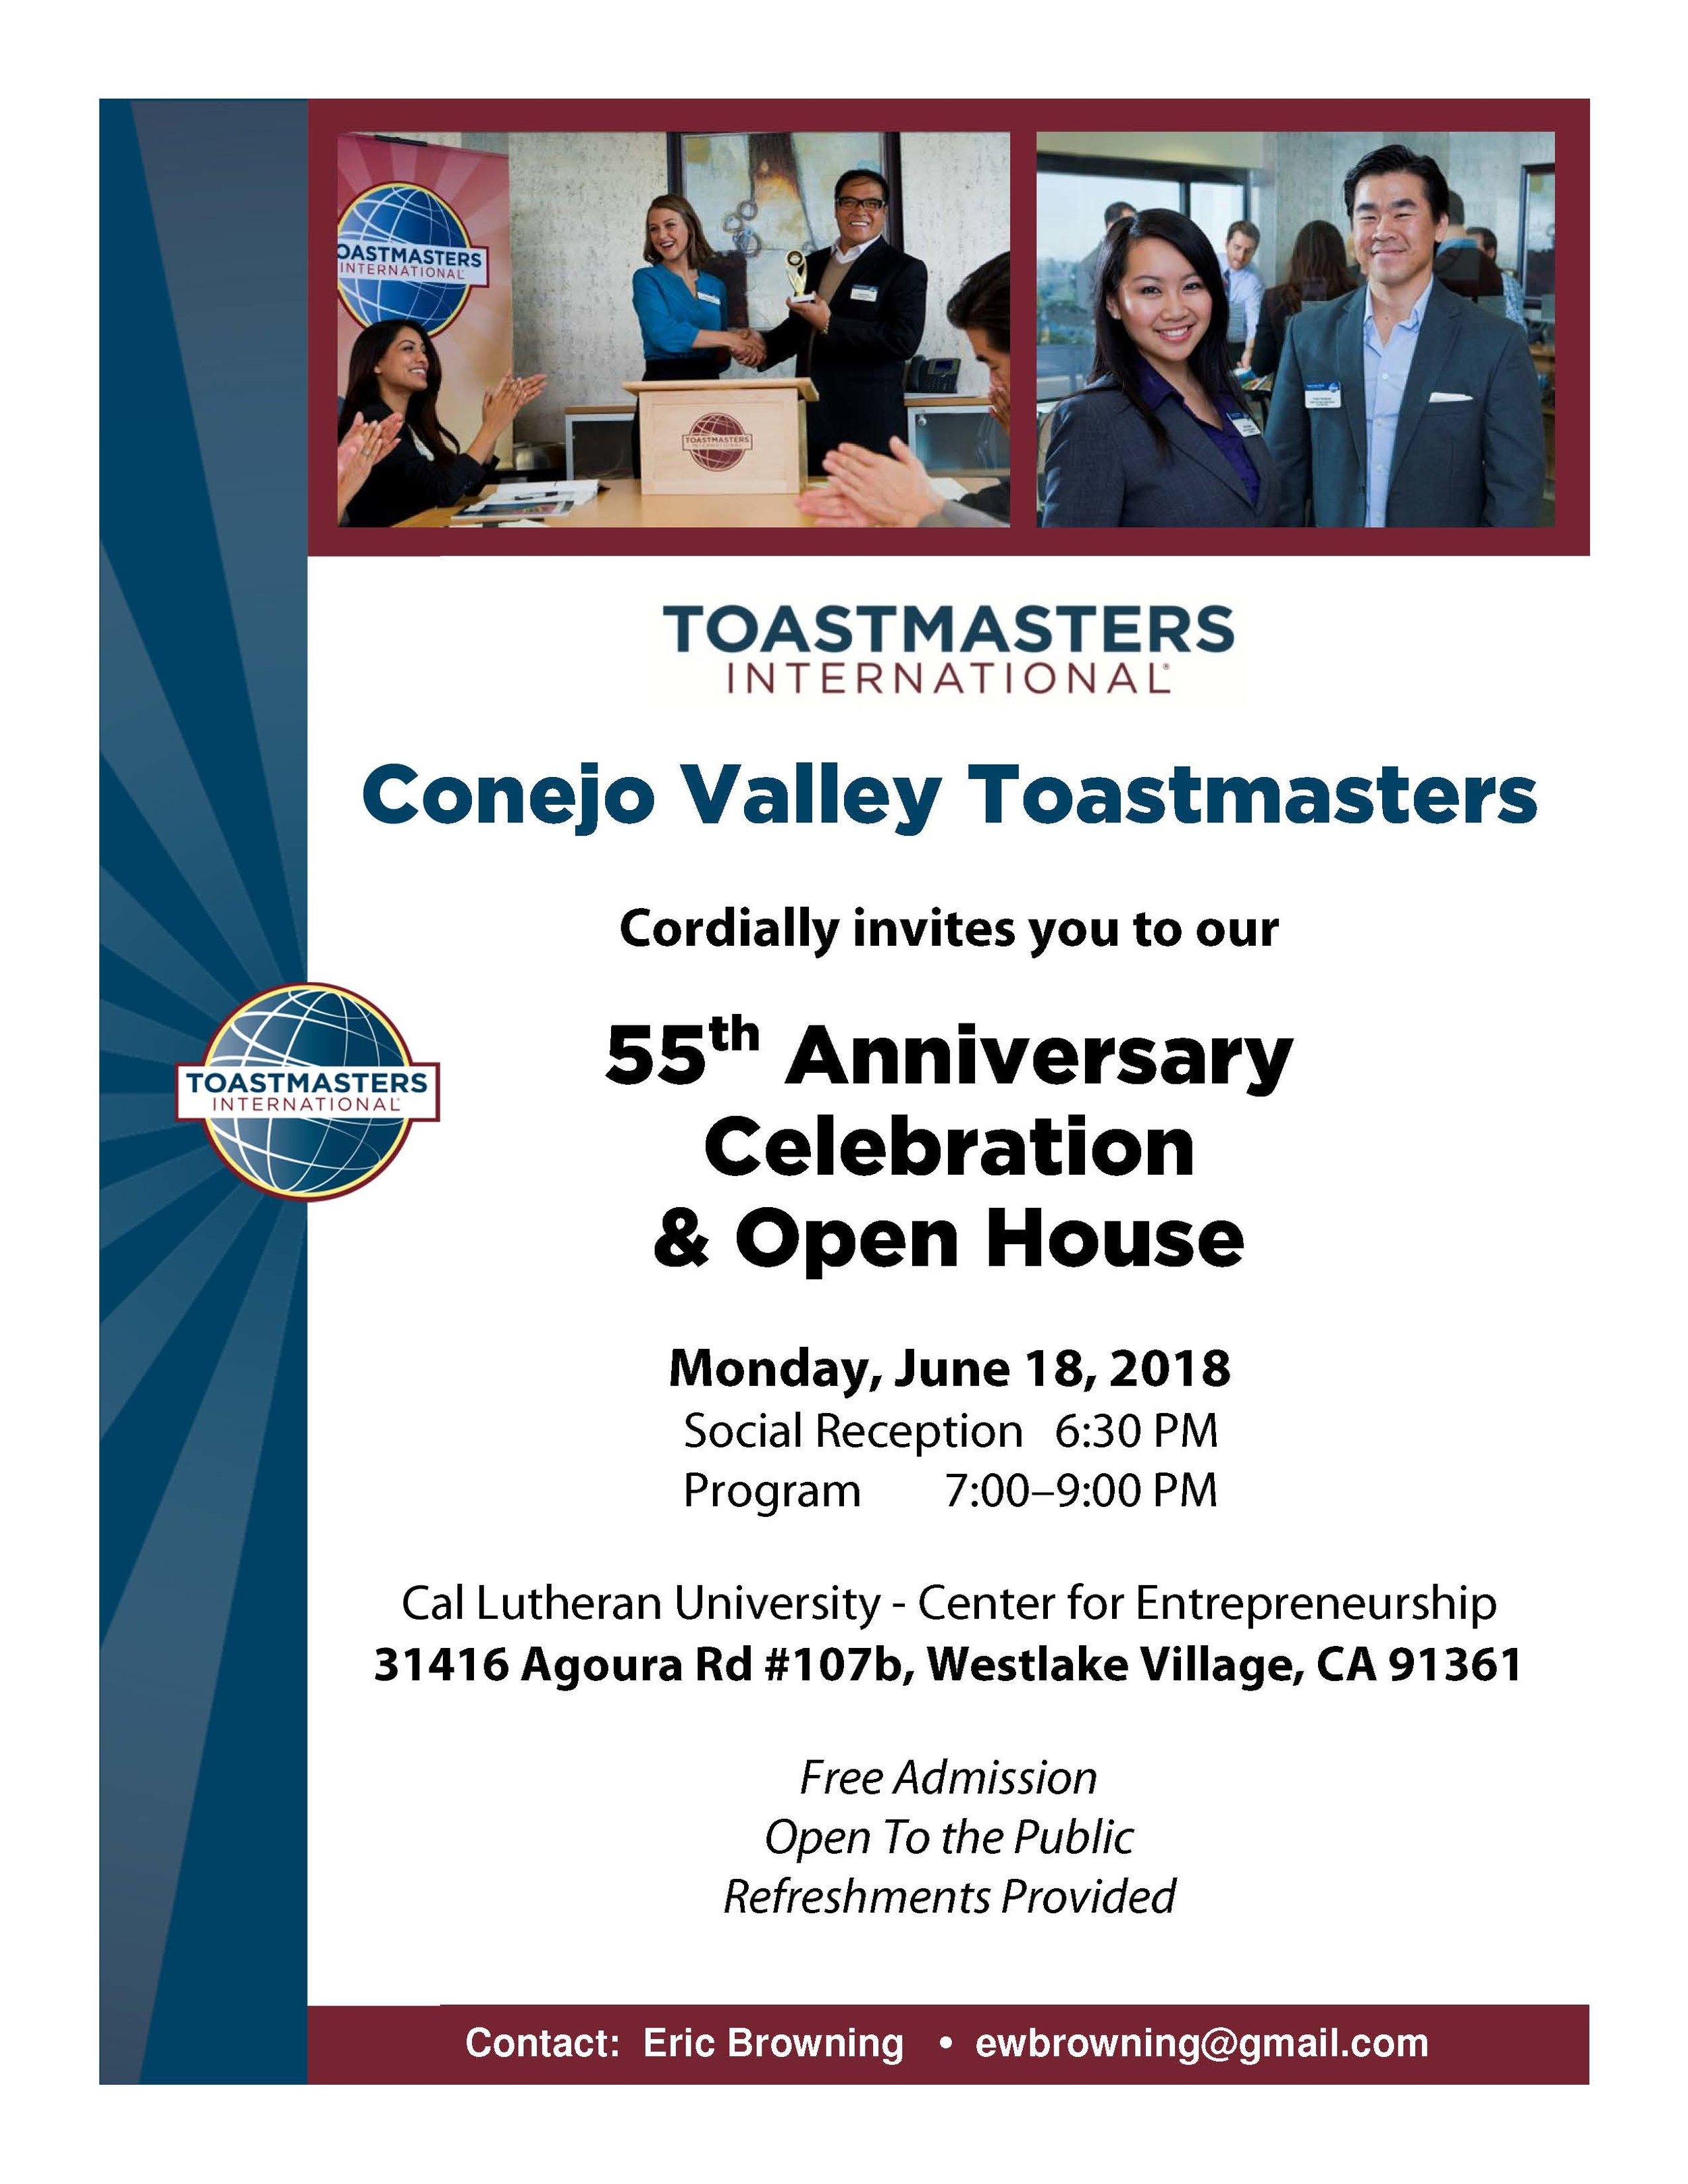 Conejo Valley Toastmasters .jpg